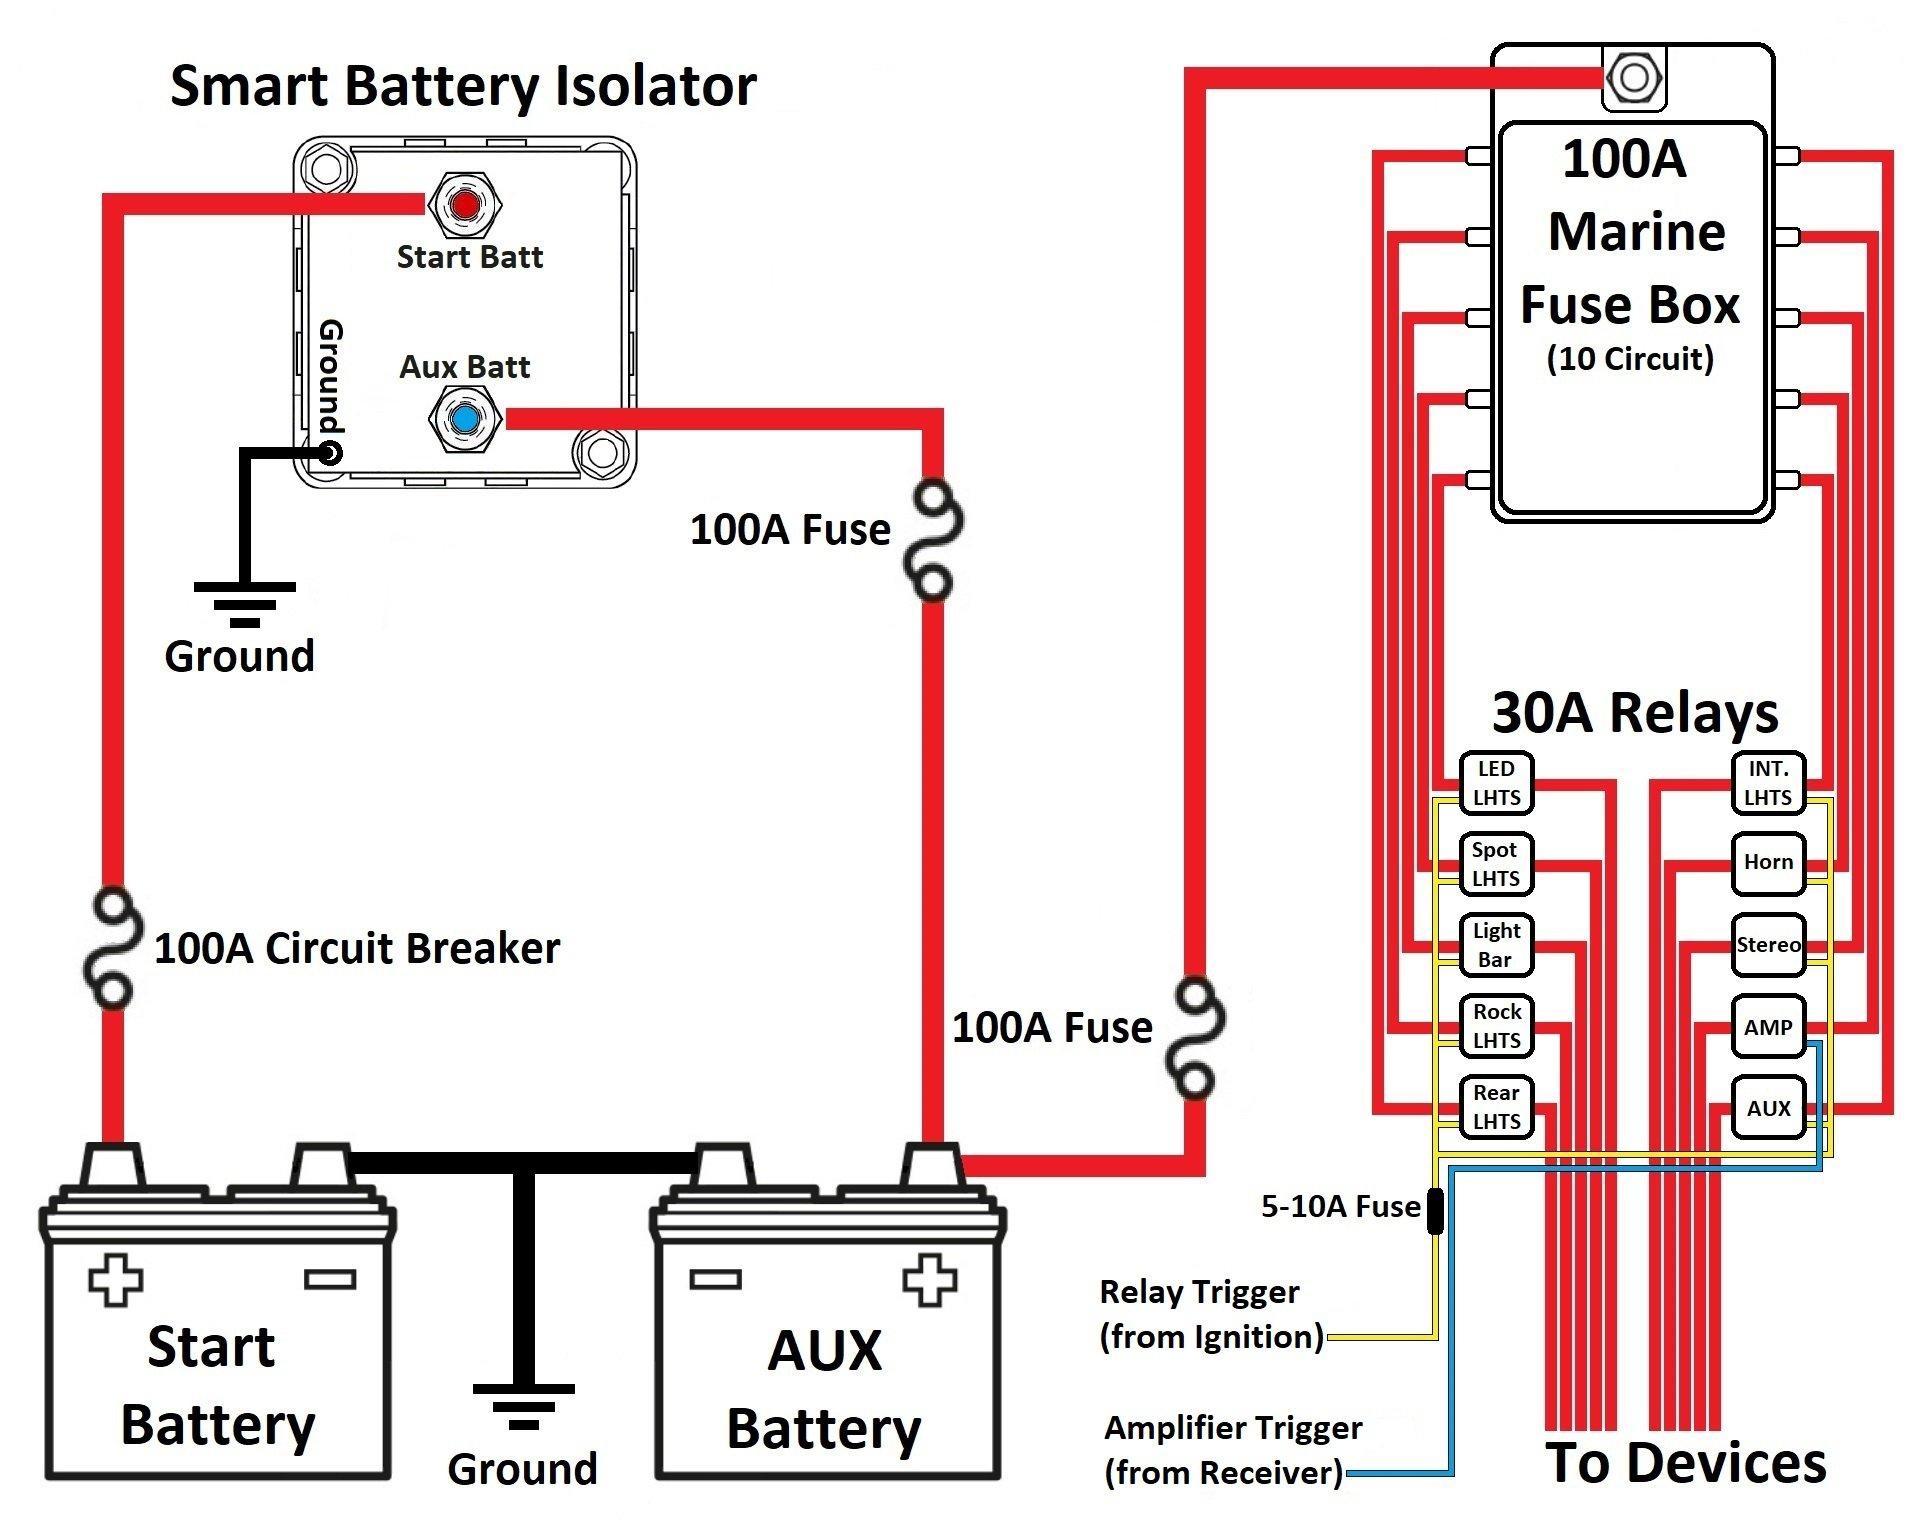 Smart Battery Isolator-Dual Battery Wiring Diagram | Polaris ACE Forum | Battery Isolator Wiring Diagram Sp |  | Polaris ACE Forum